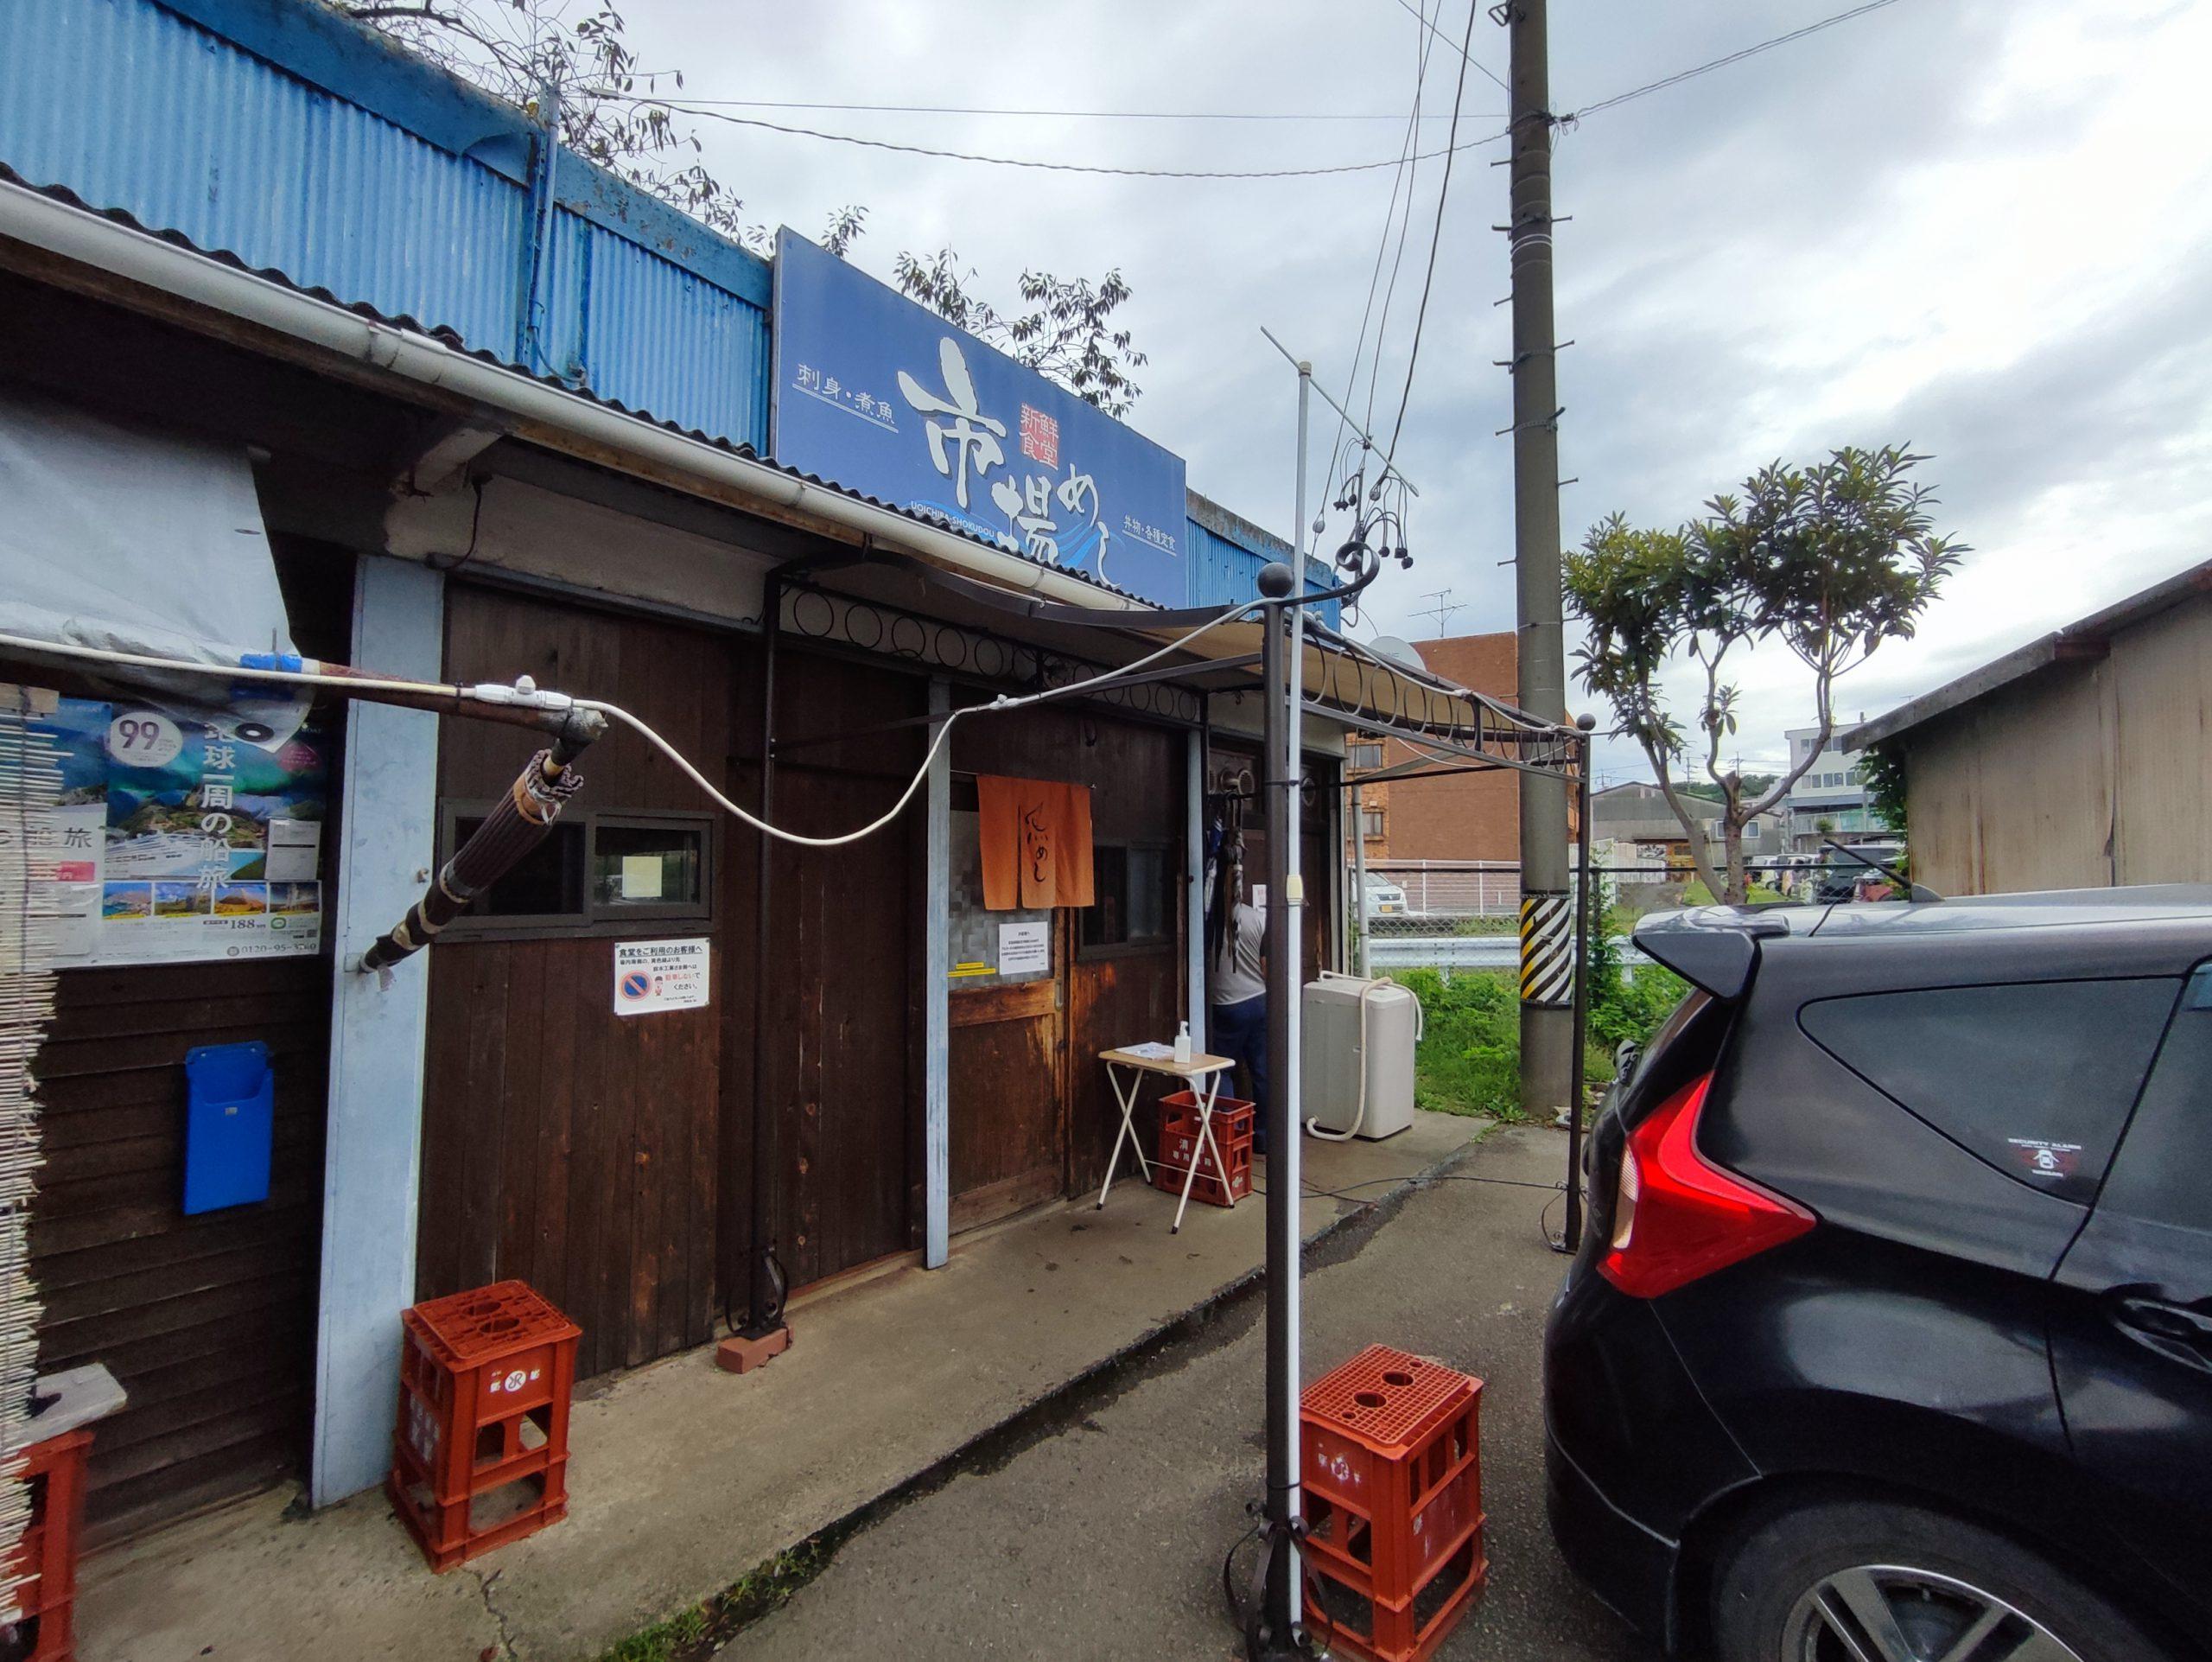 岡崎-平の屋-外観1-0917